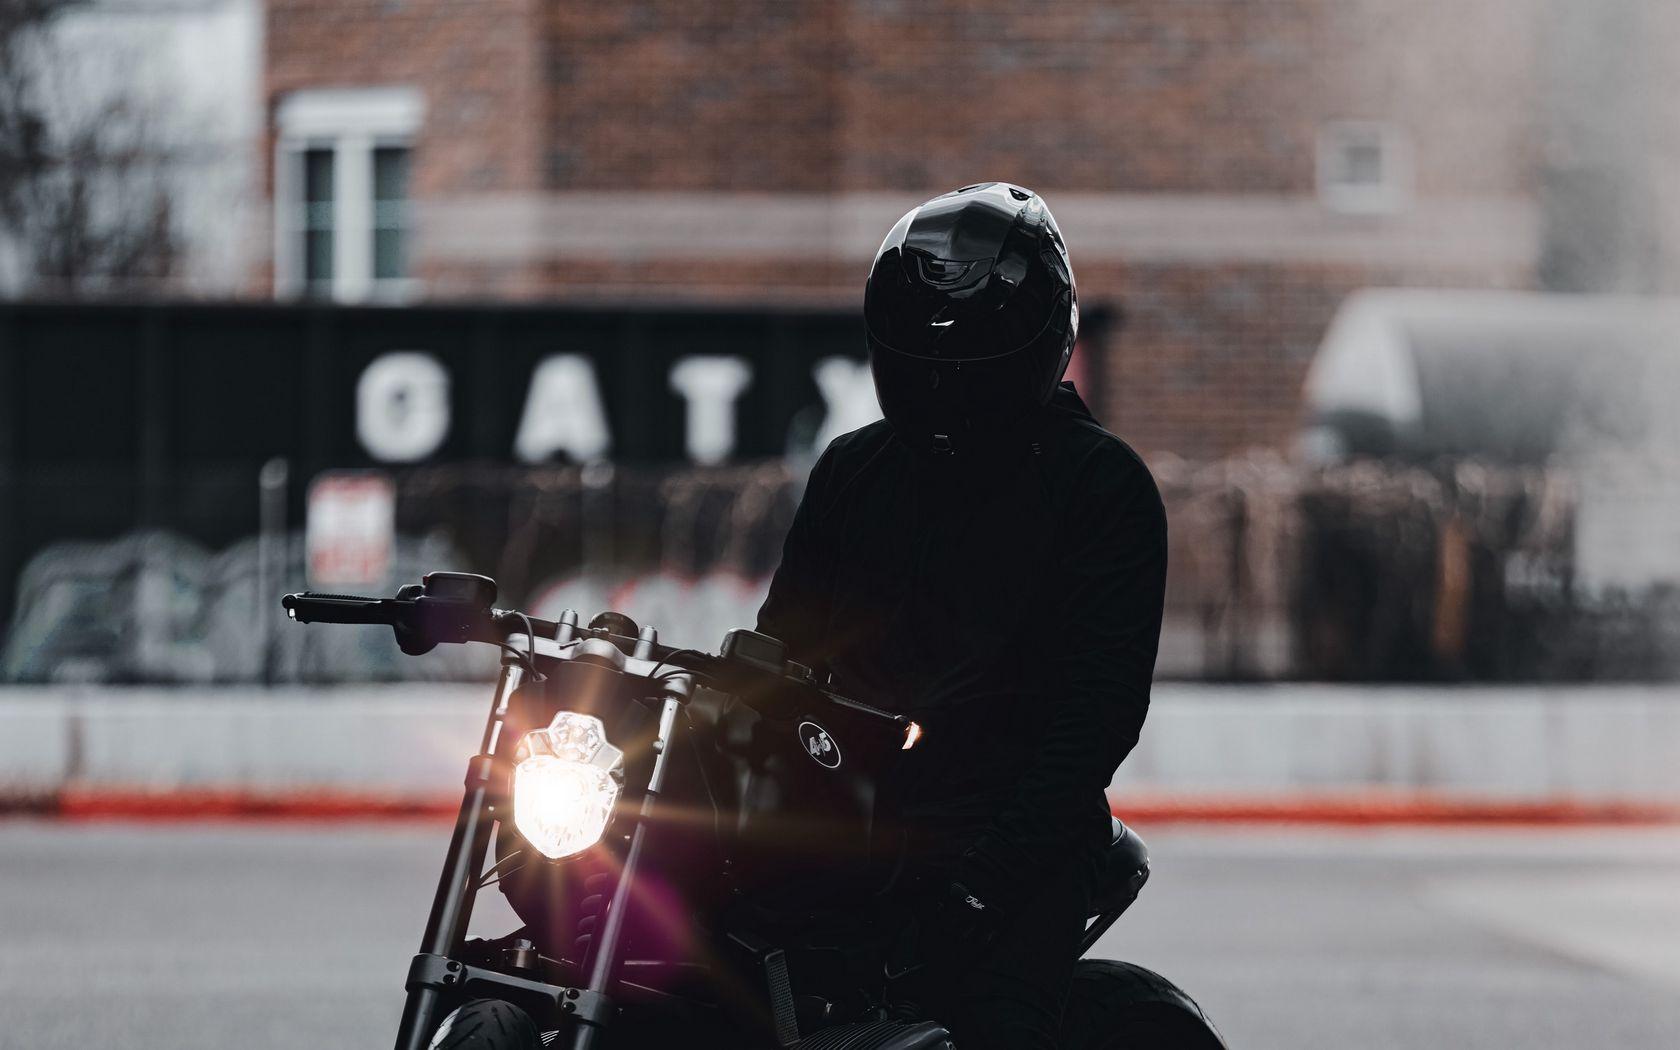 1680x1050 Обои мотоцикл, байк, мотоциклист, черный, свет, дорога